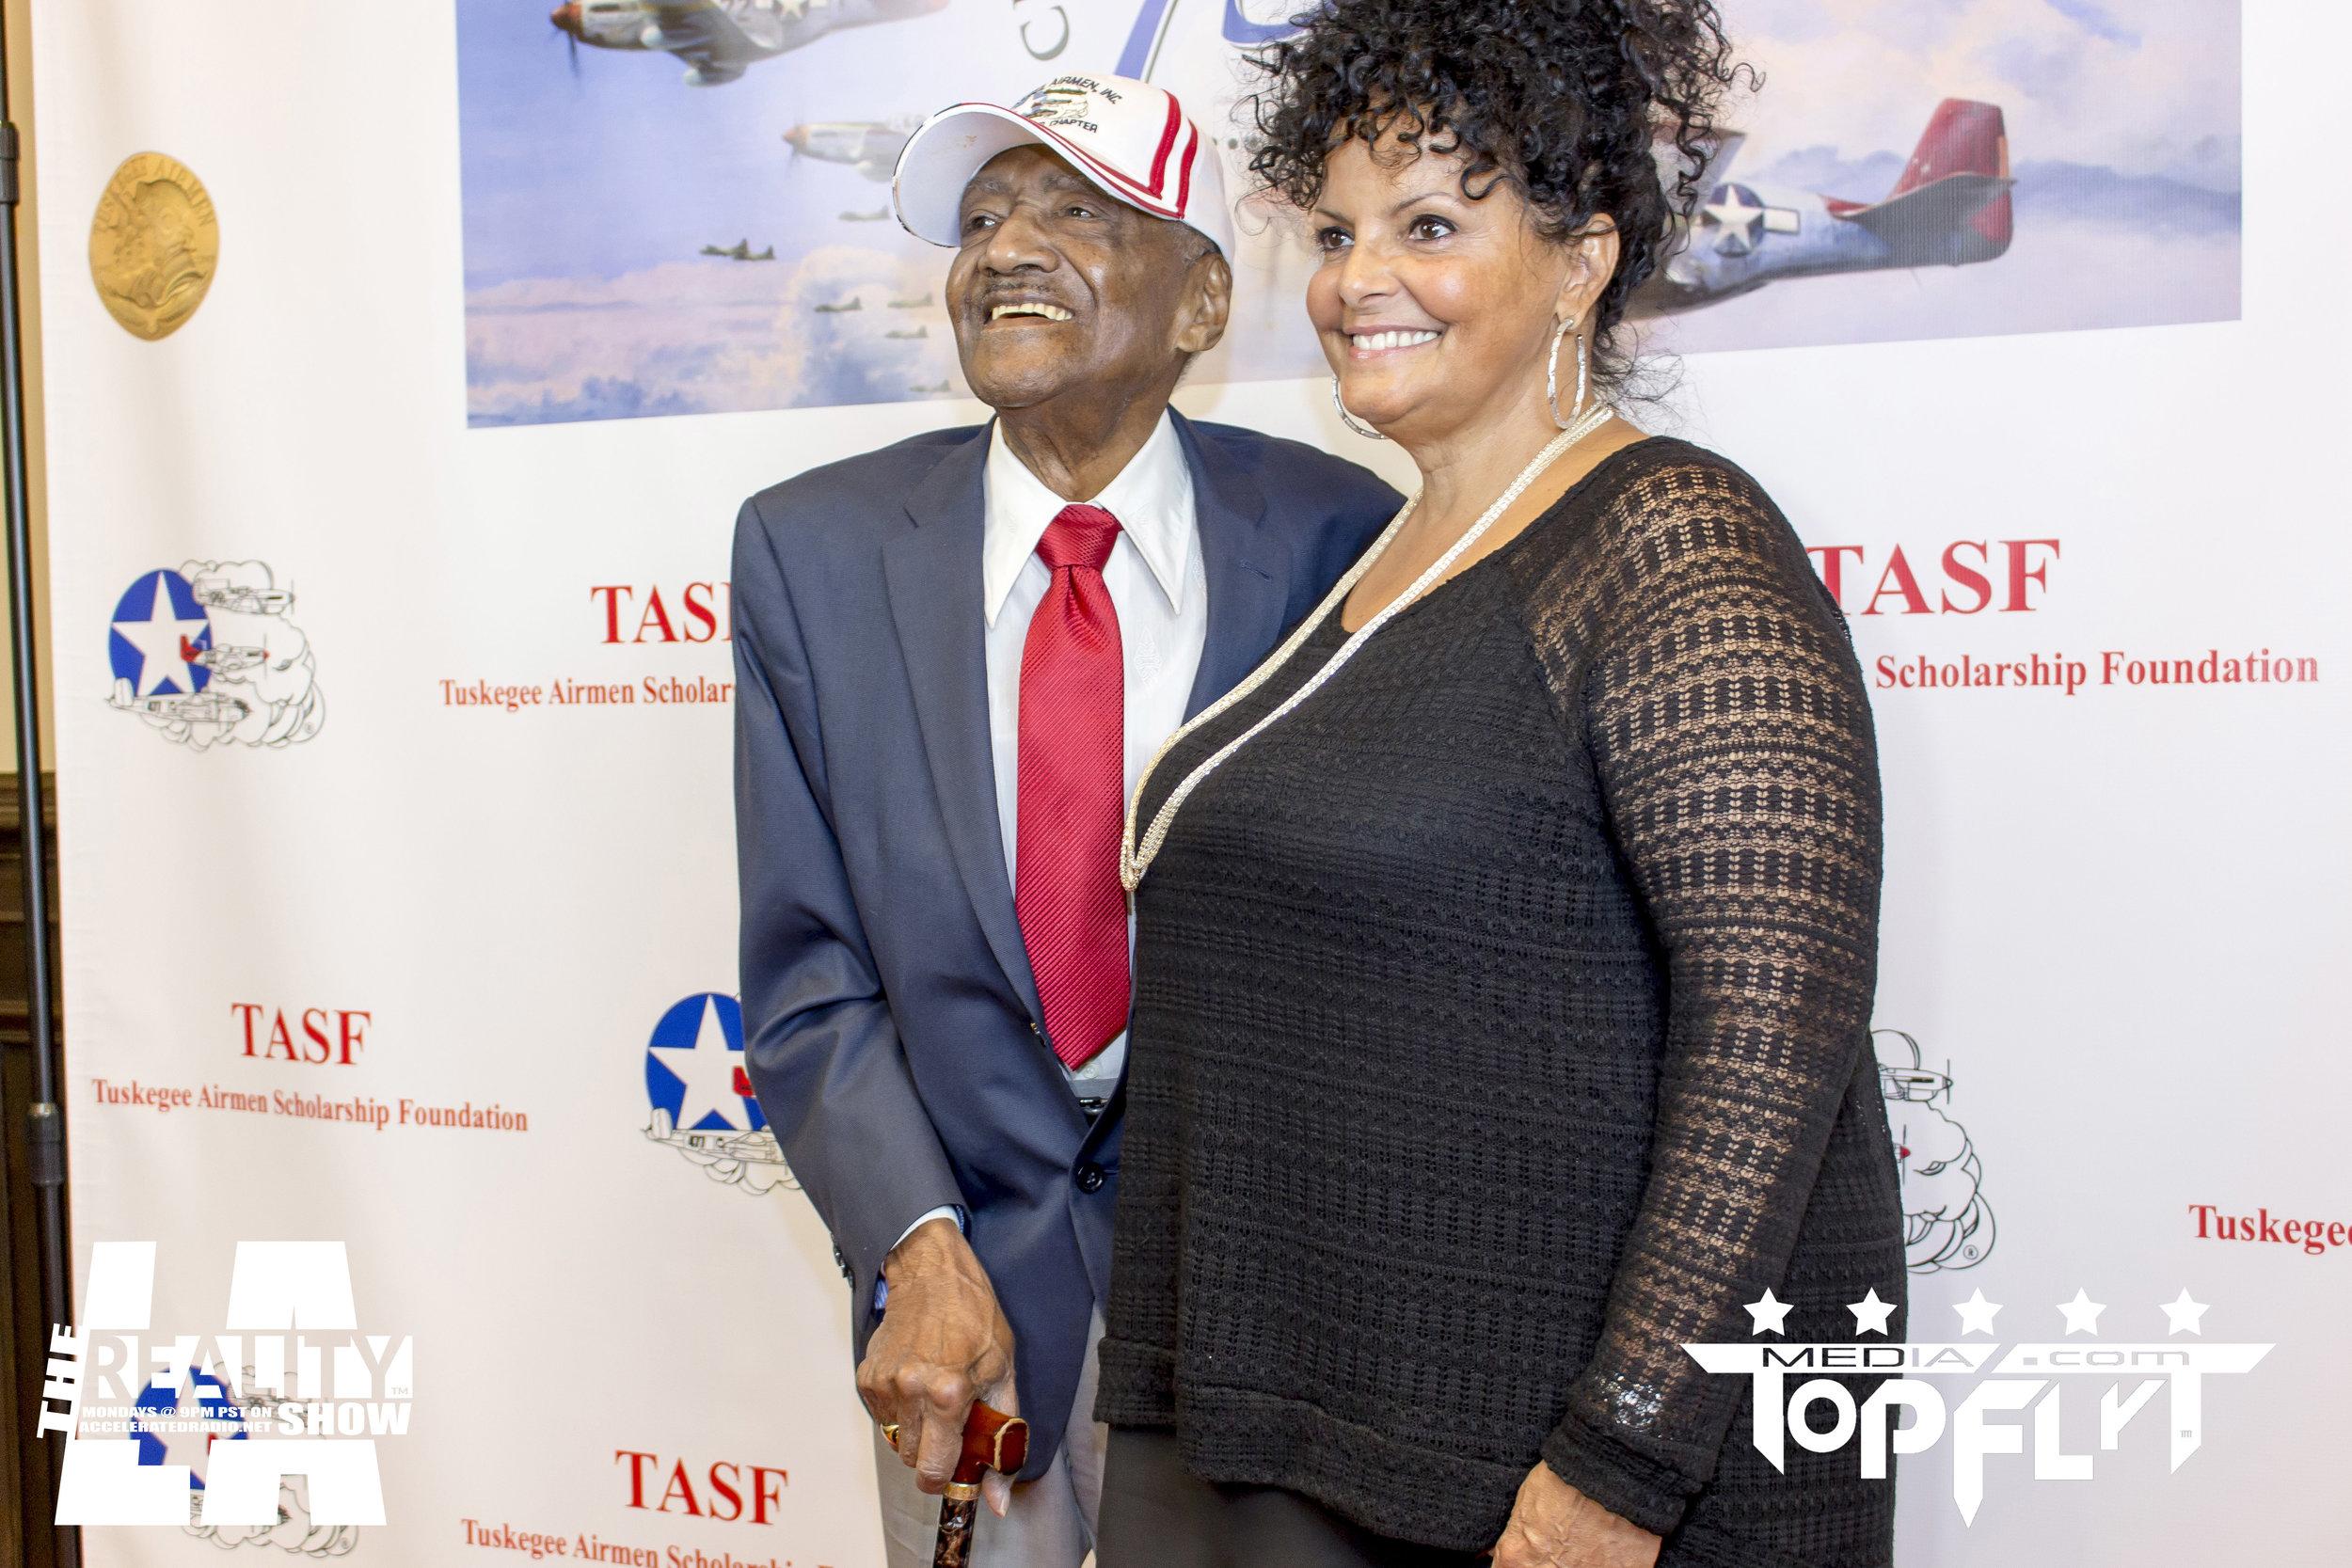 The Reality Show LA - Tuskegee Airmen 75th Anniversary VIP Reception_12.jpg